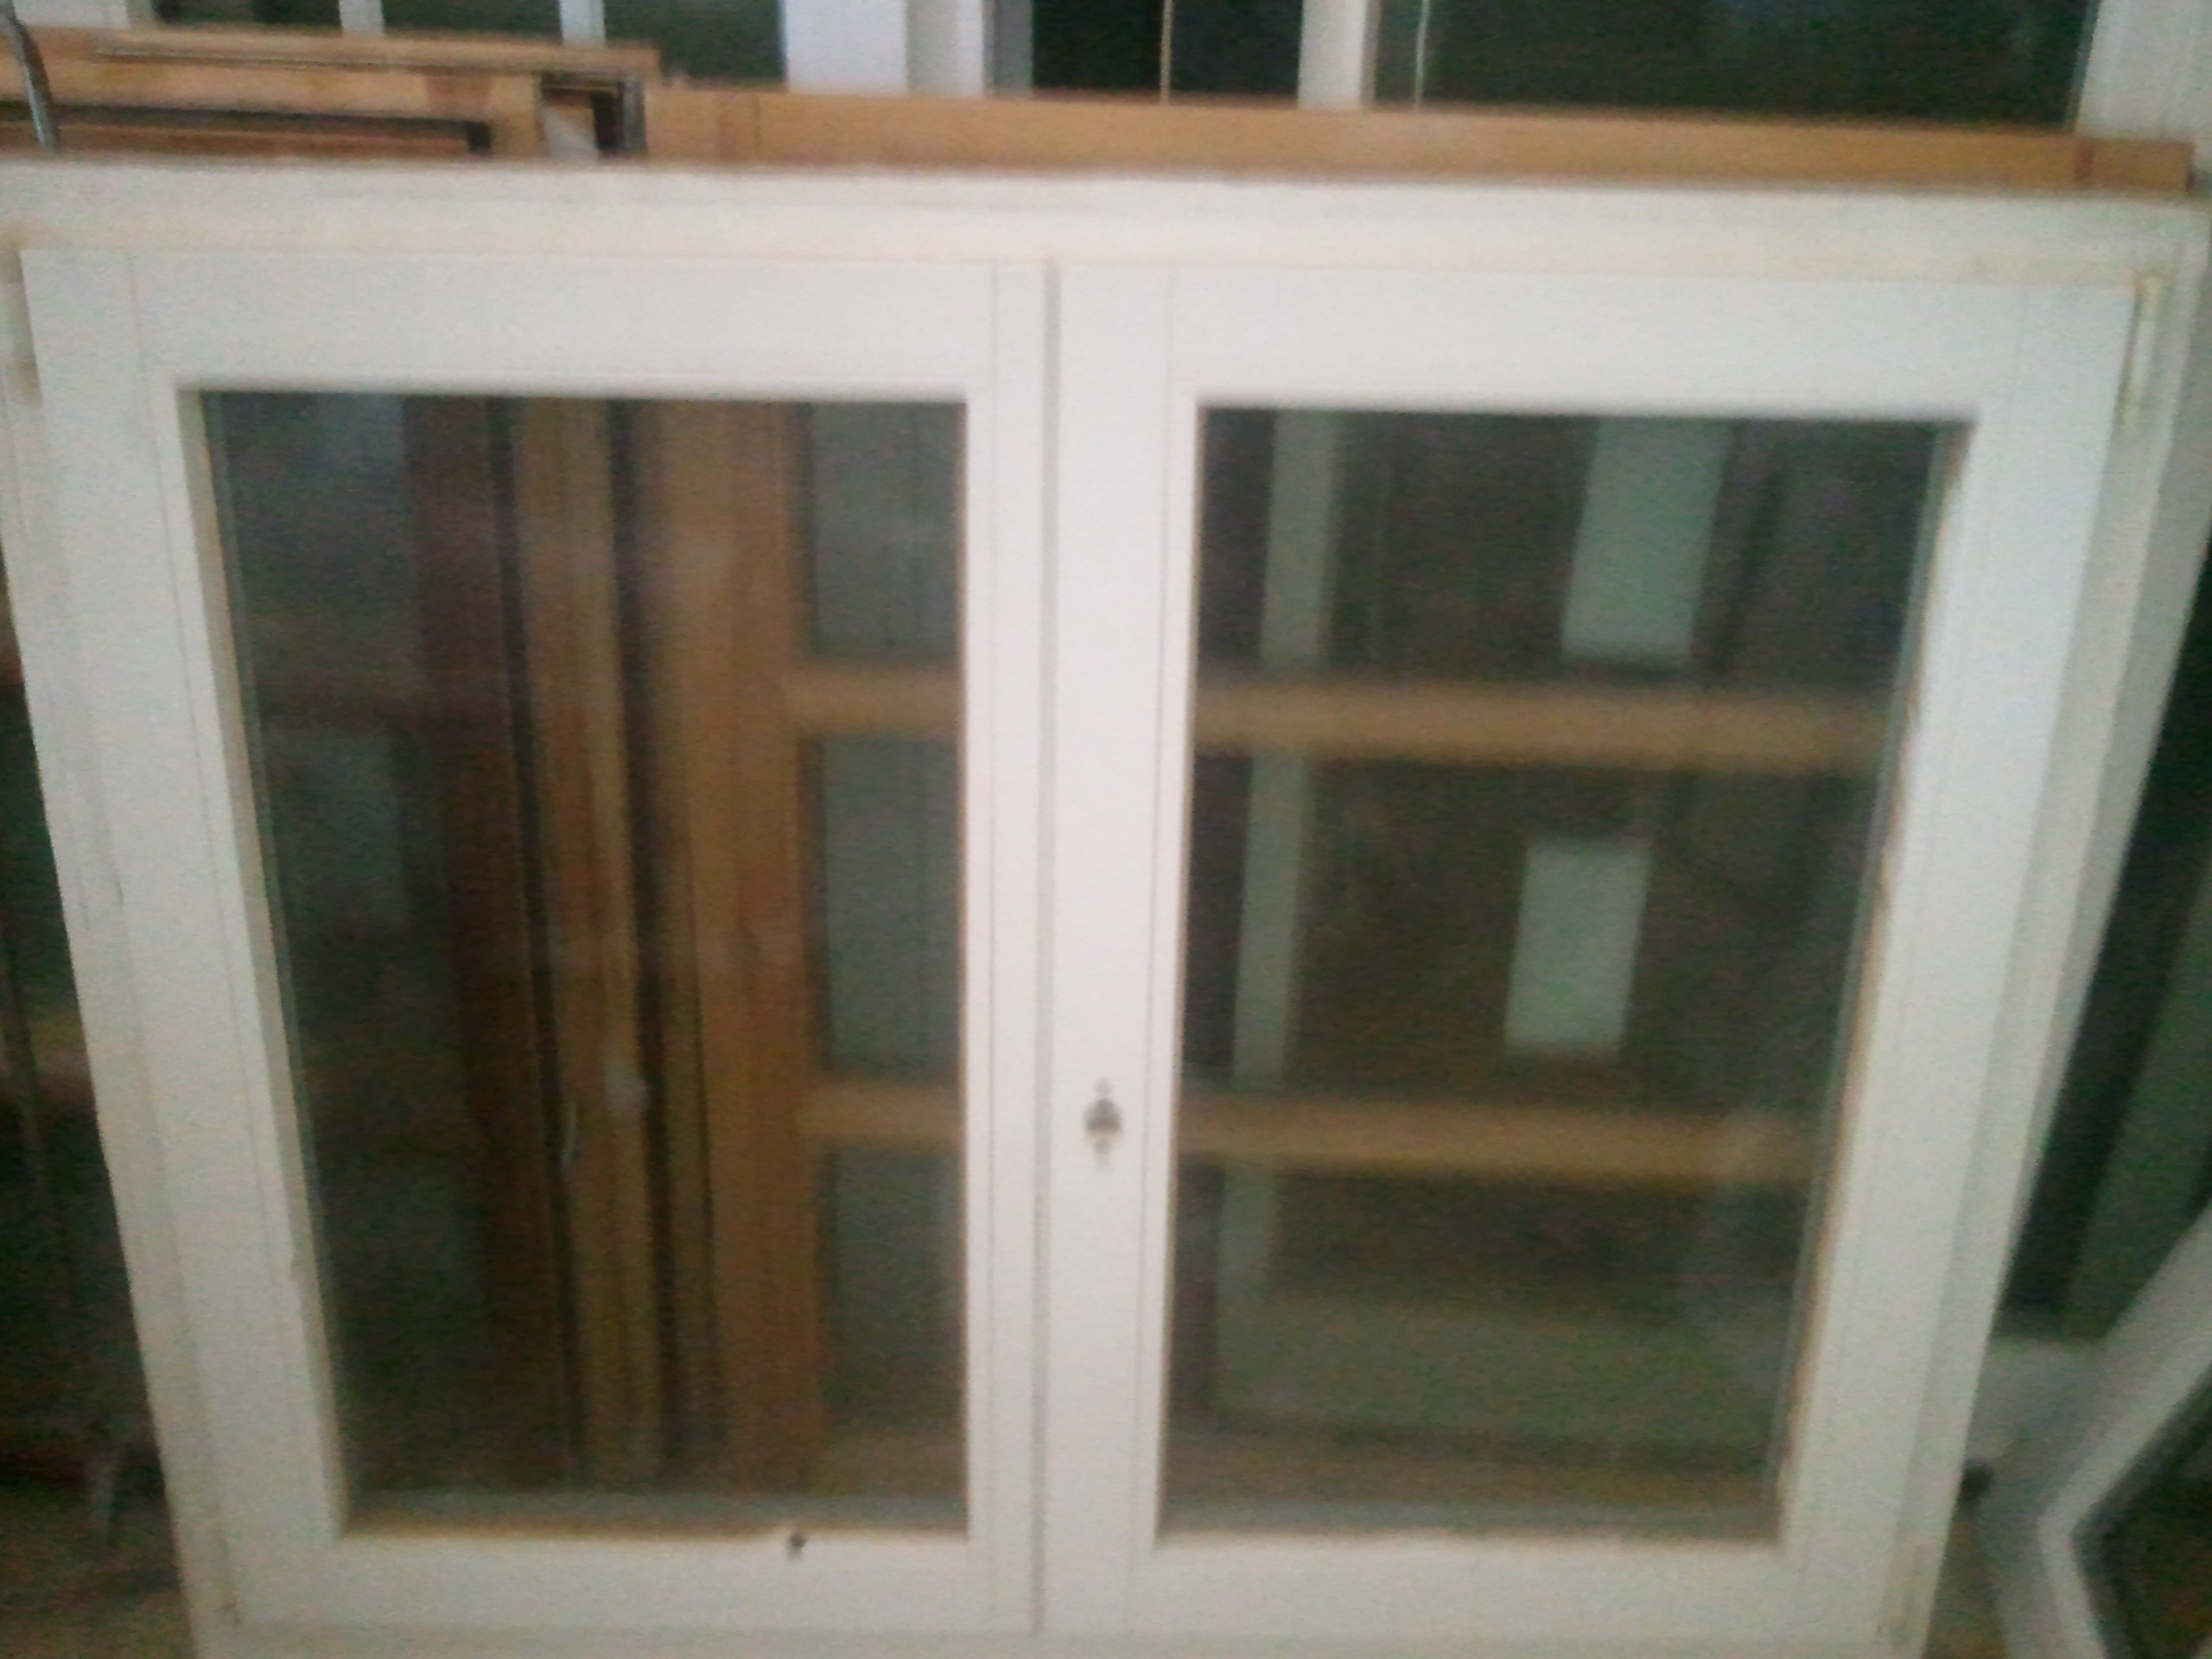 #604B33 250€  Wooden window double glazed 4286 Janela Aluminio Branco 100 X 150